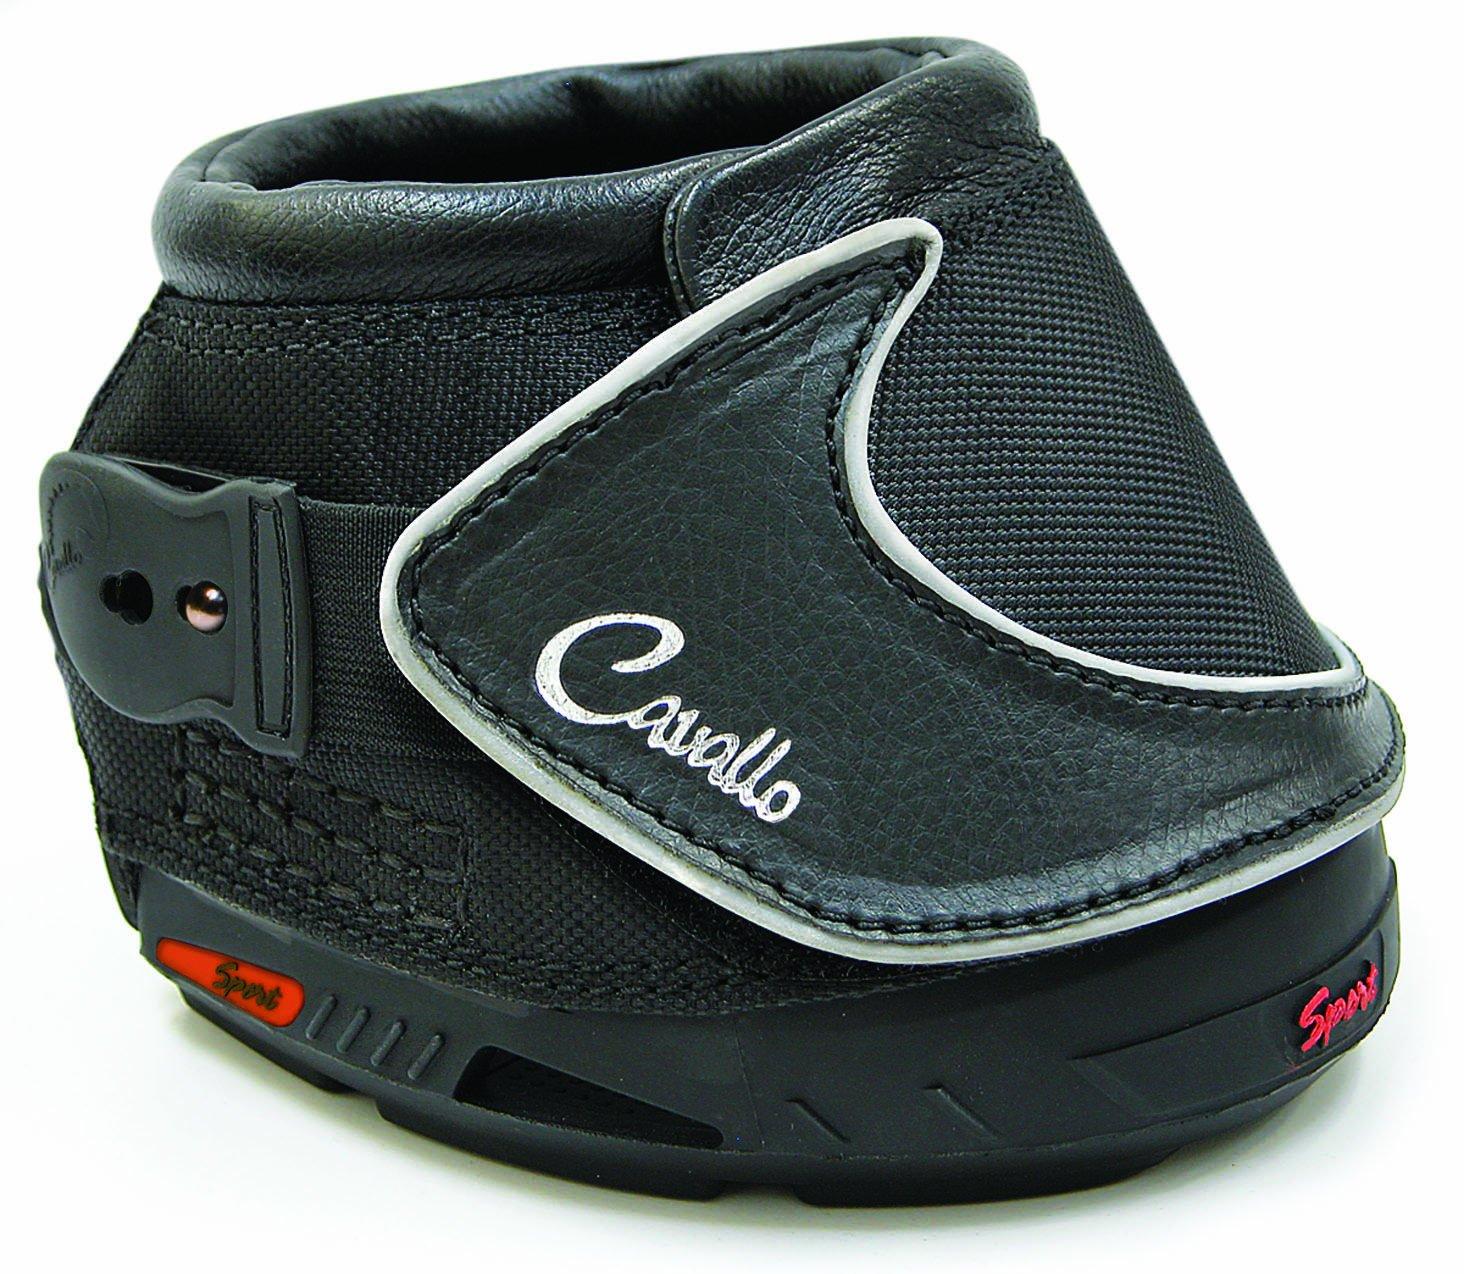 Cavallo Sport Hoof Boot for Horses, Size 0, Black